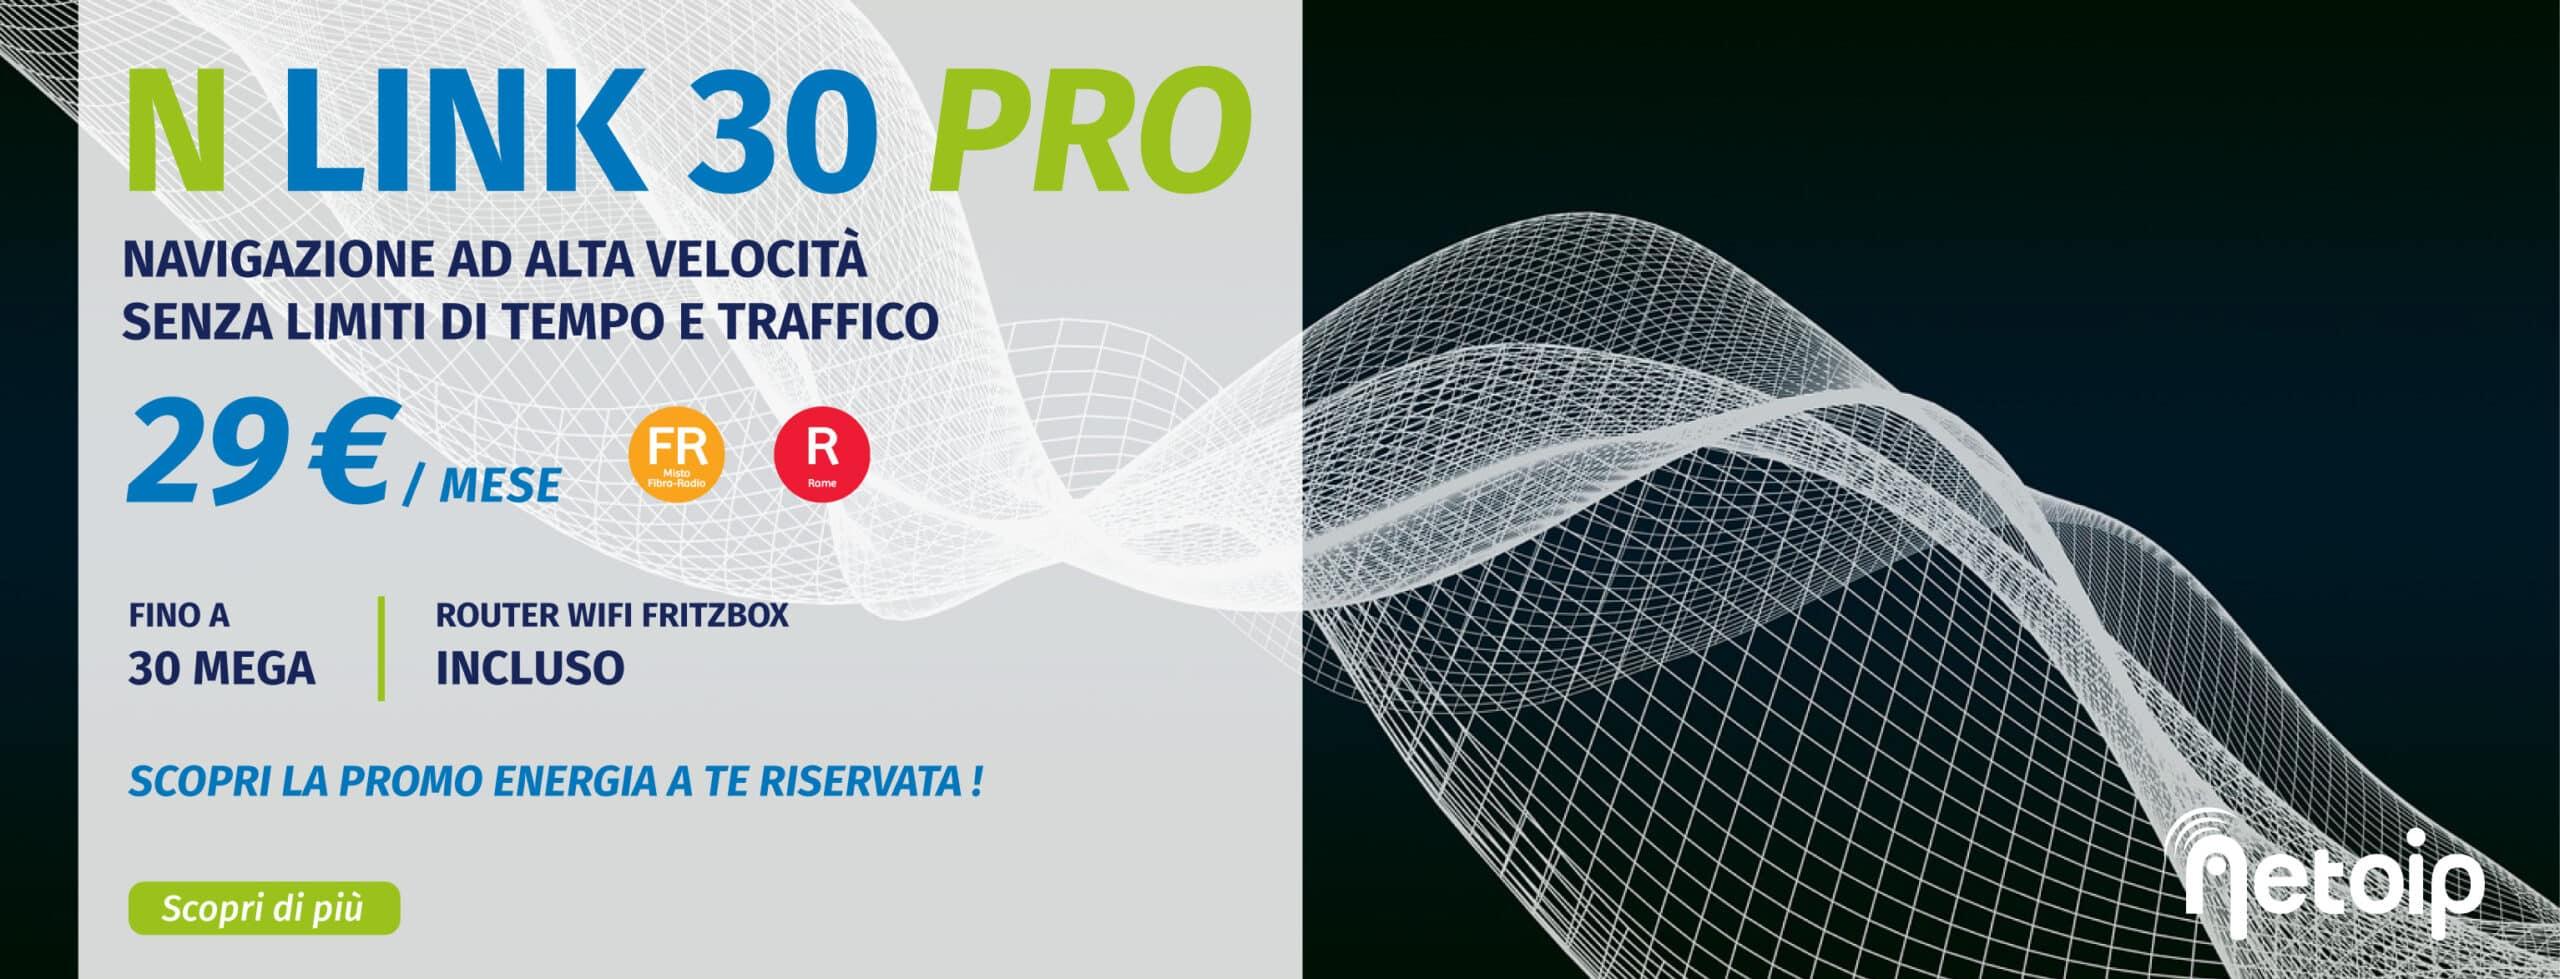 N Link 30 Pro - Fwa